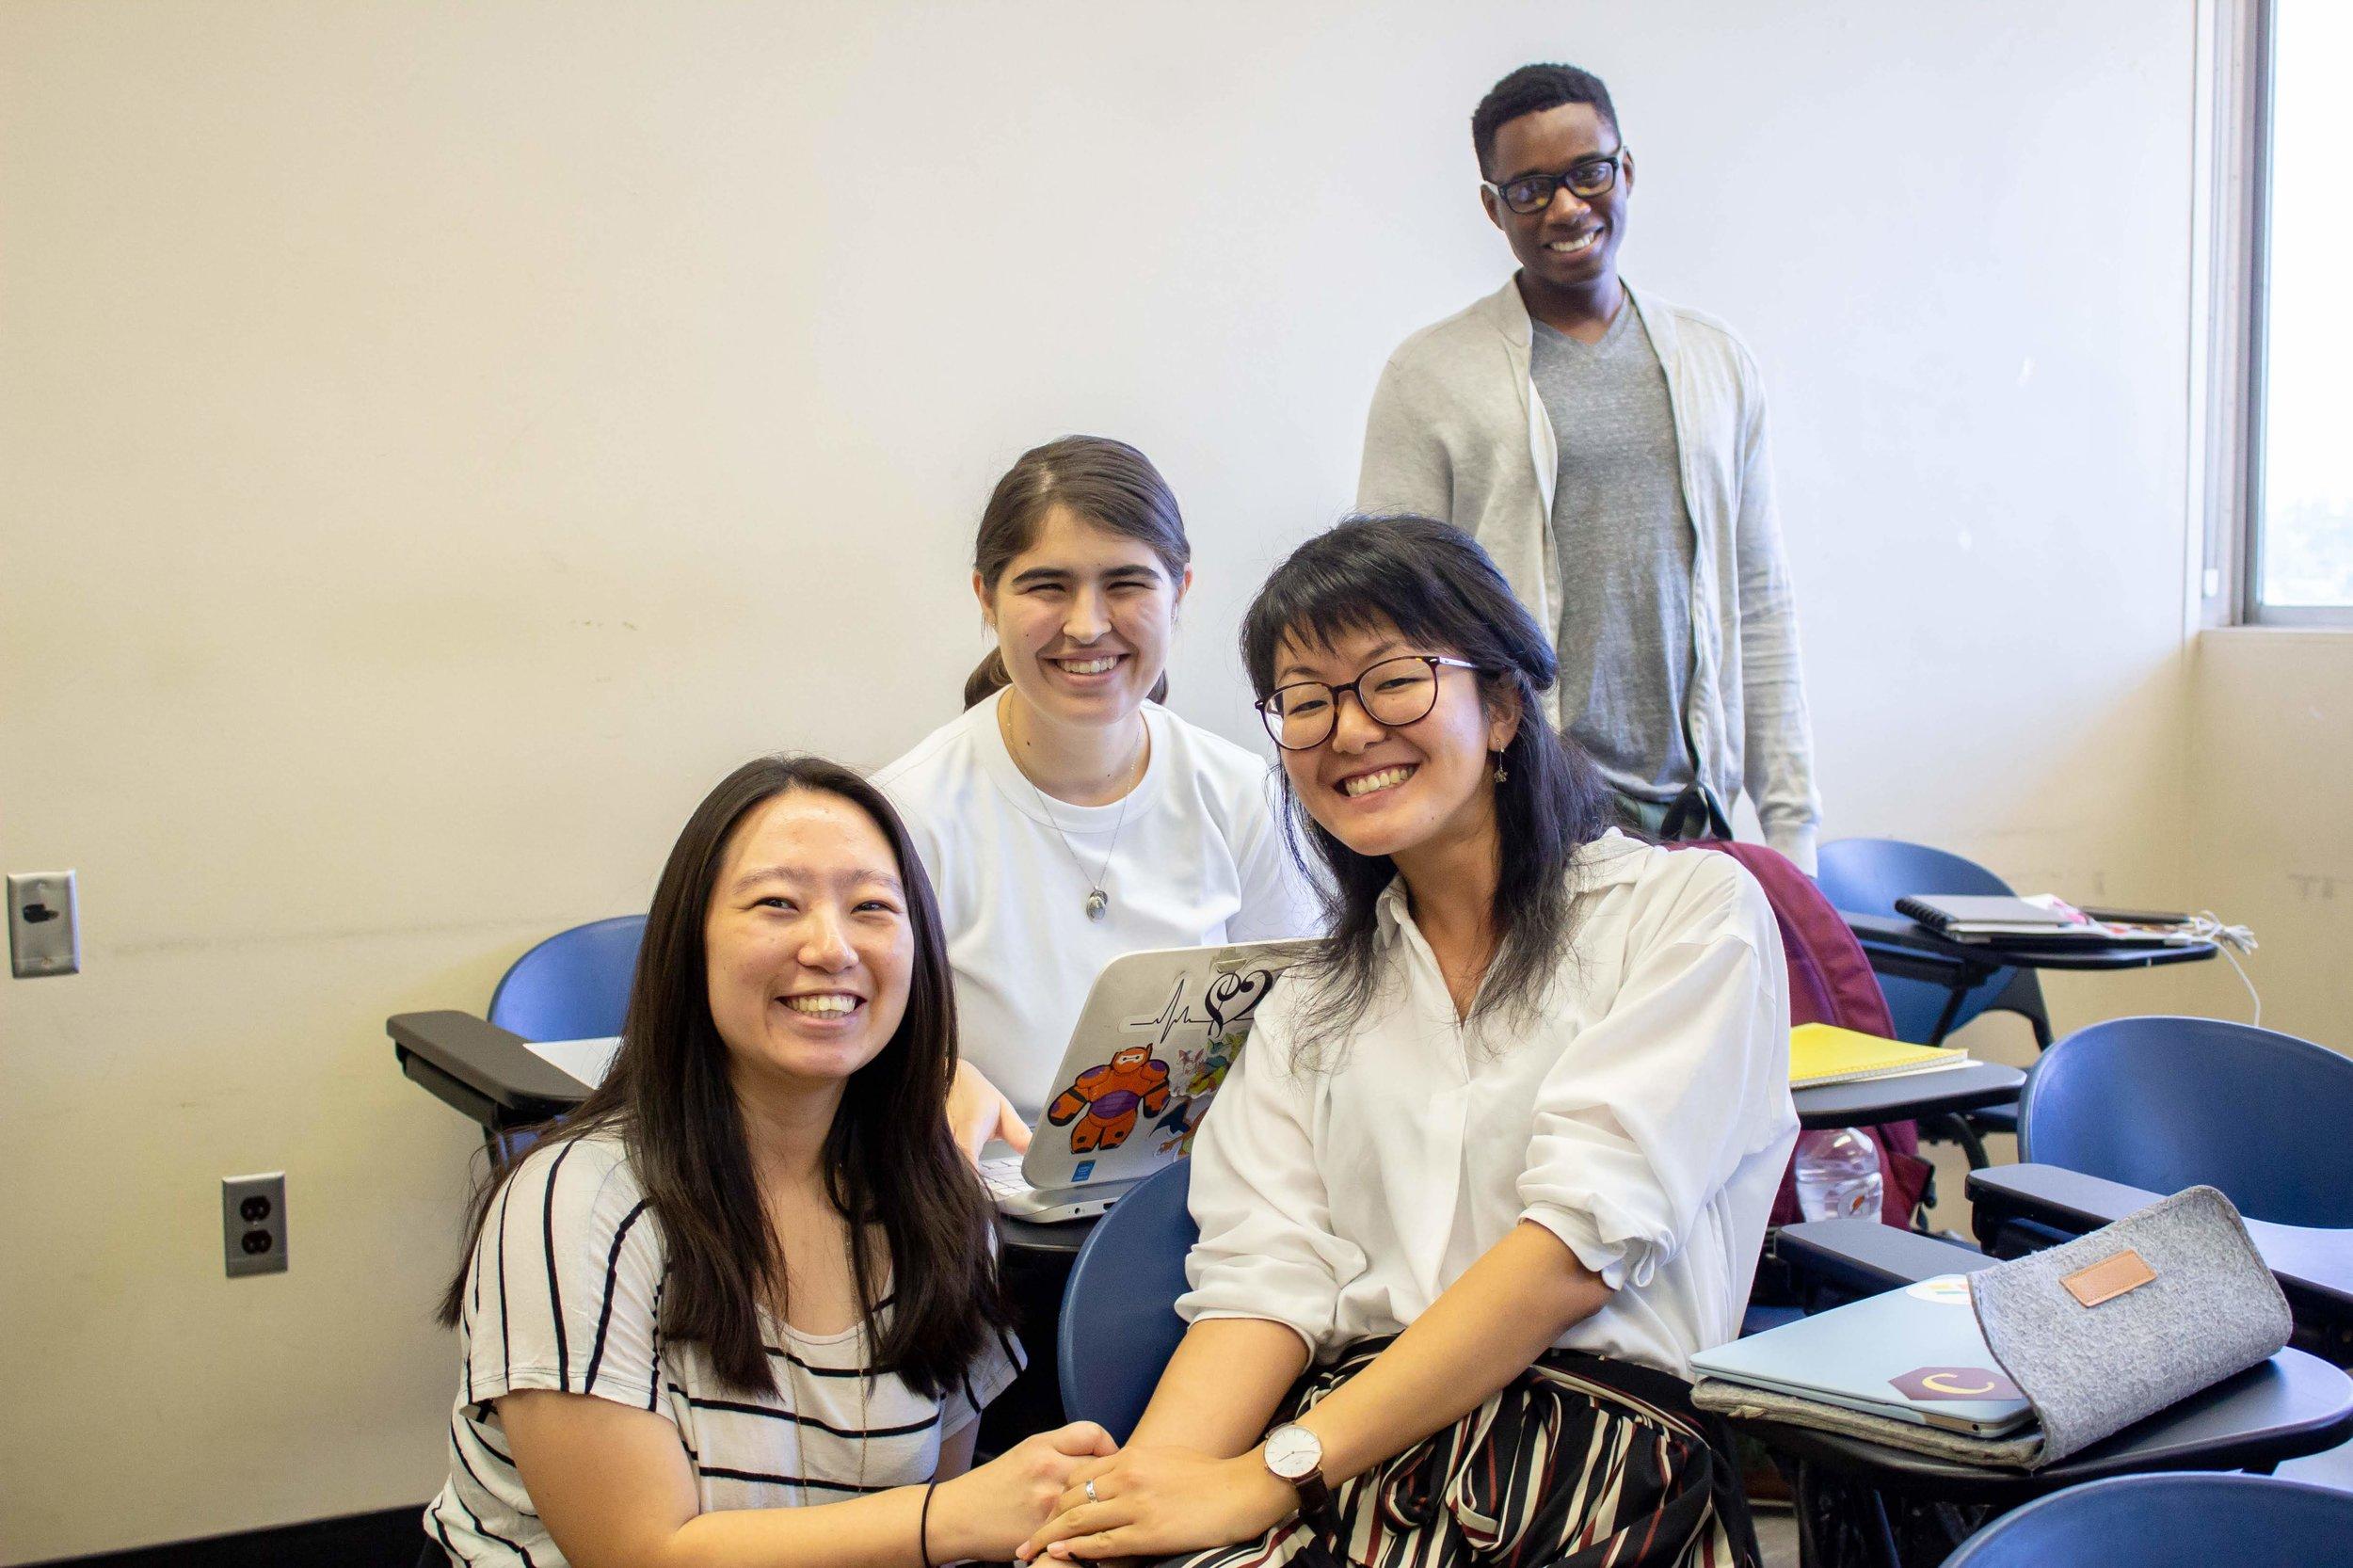 Satomi and the CSULA crew: Hitoe Hiraki (left), Sarah Takhar (middle back), and Jermaine Bishop (back right).